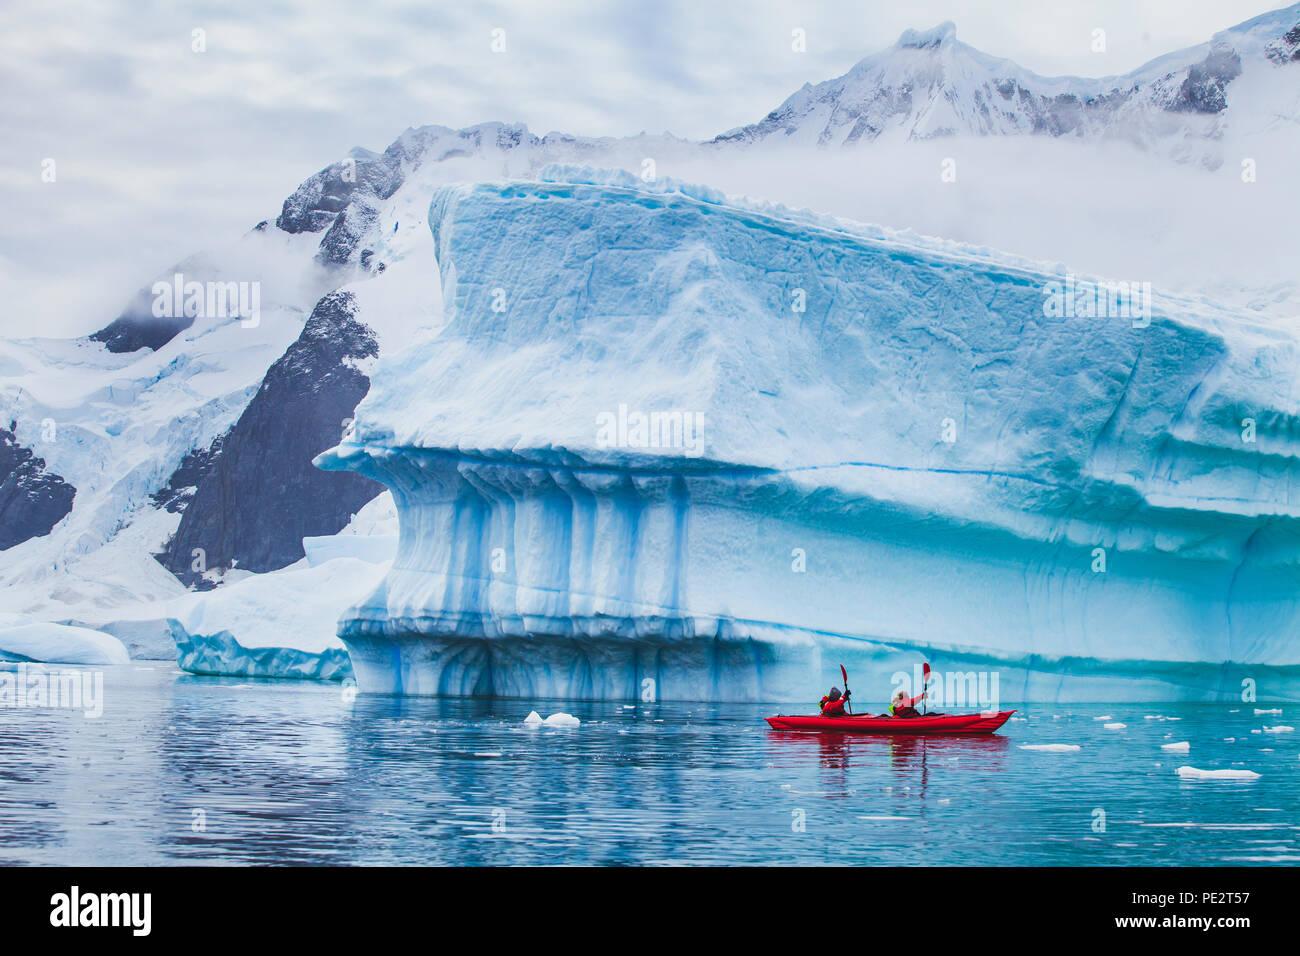 winter kayaking in Antarctica, extreme sport adventure, people paddling on kayak near iceberg Stock Photo